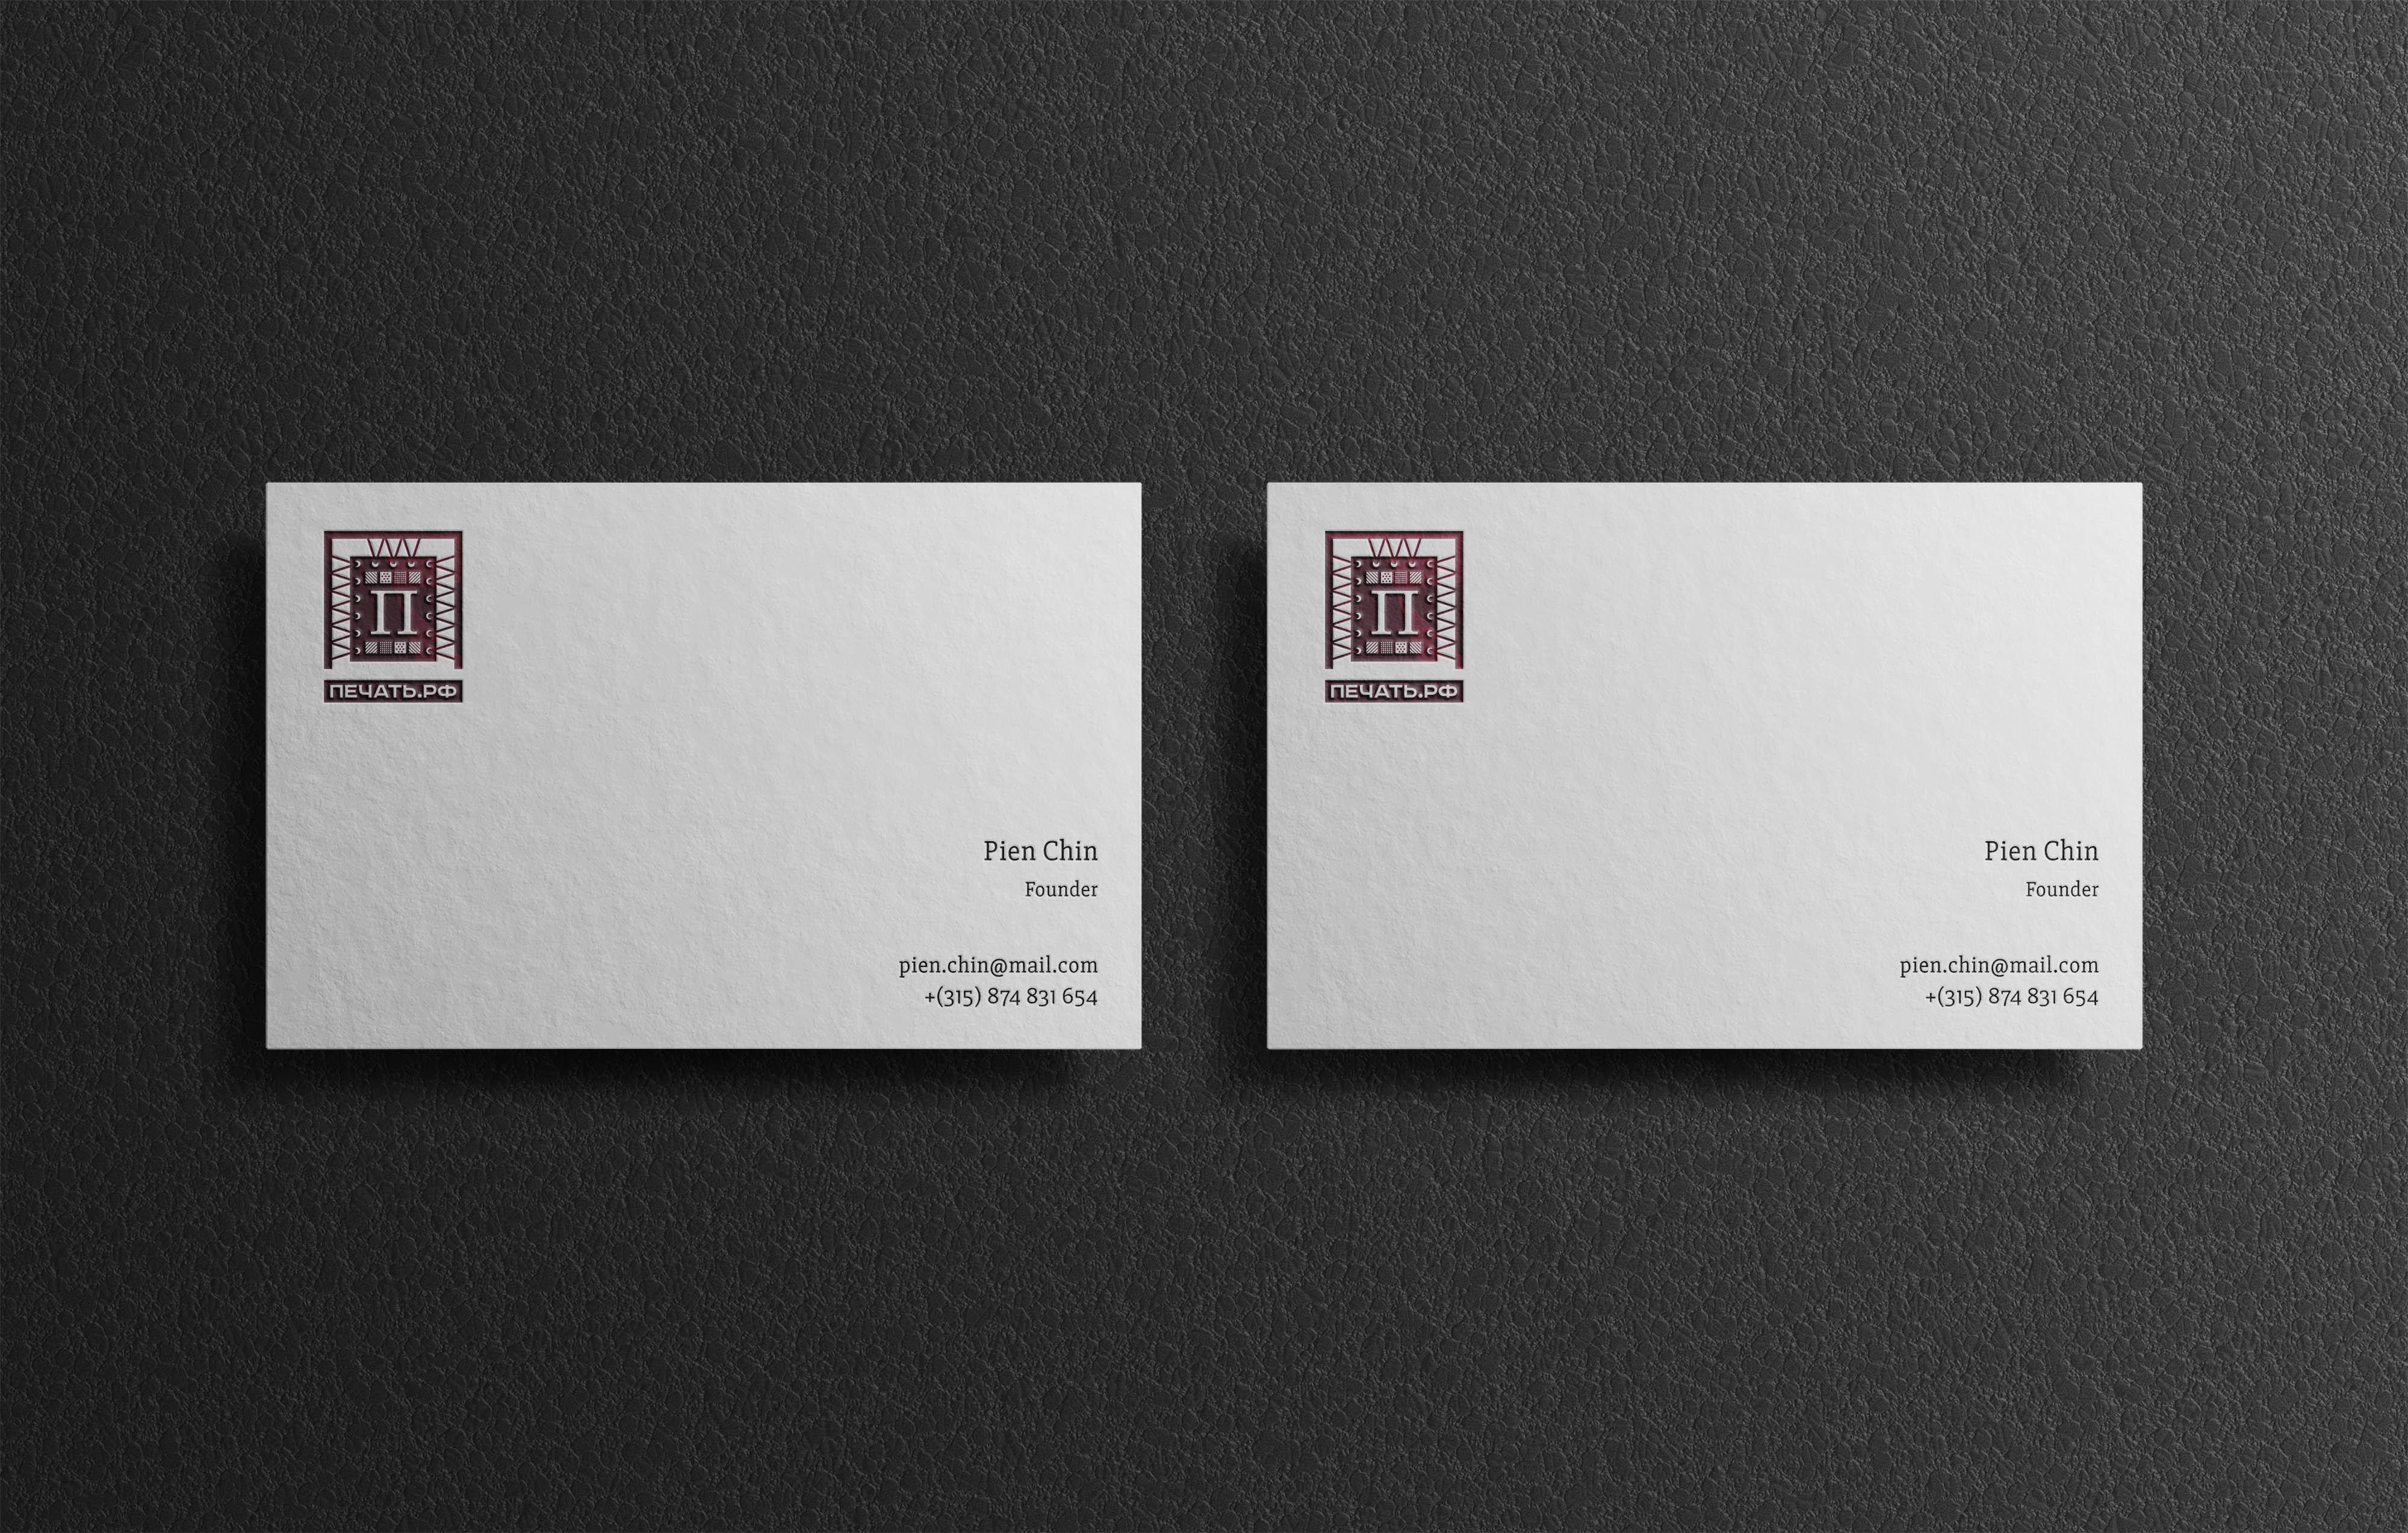 Логотип для веб-сервиса интерьерной печати и оперативной пол фото f_9865d2908e2924f2.jpg